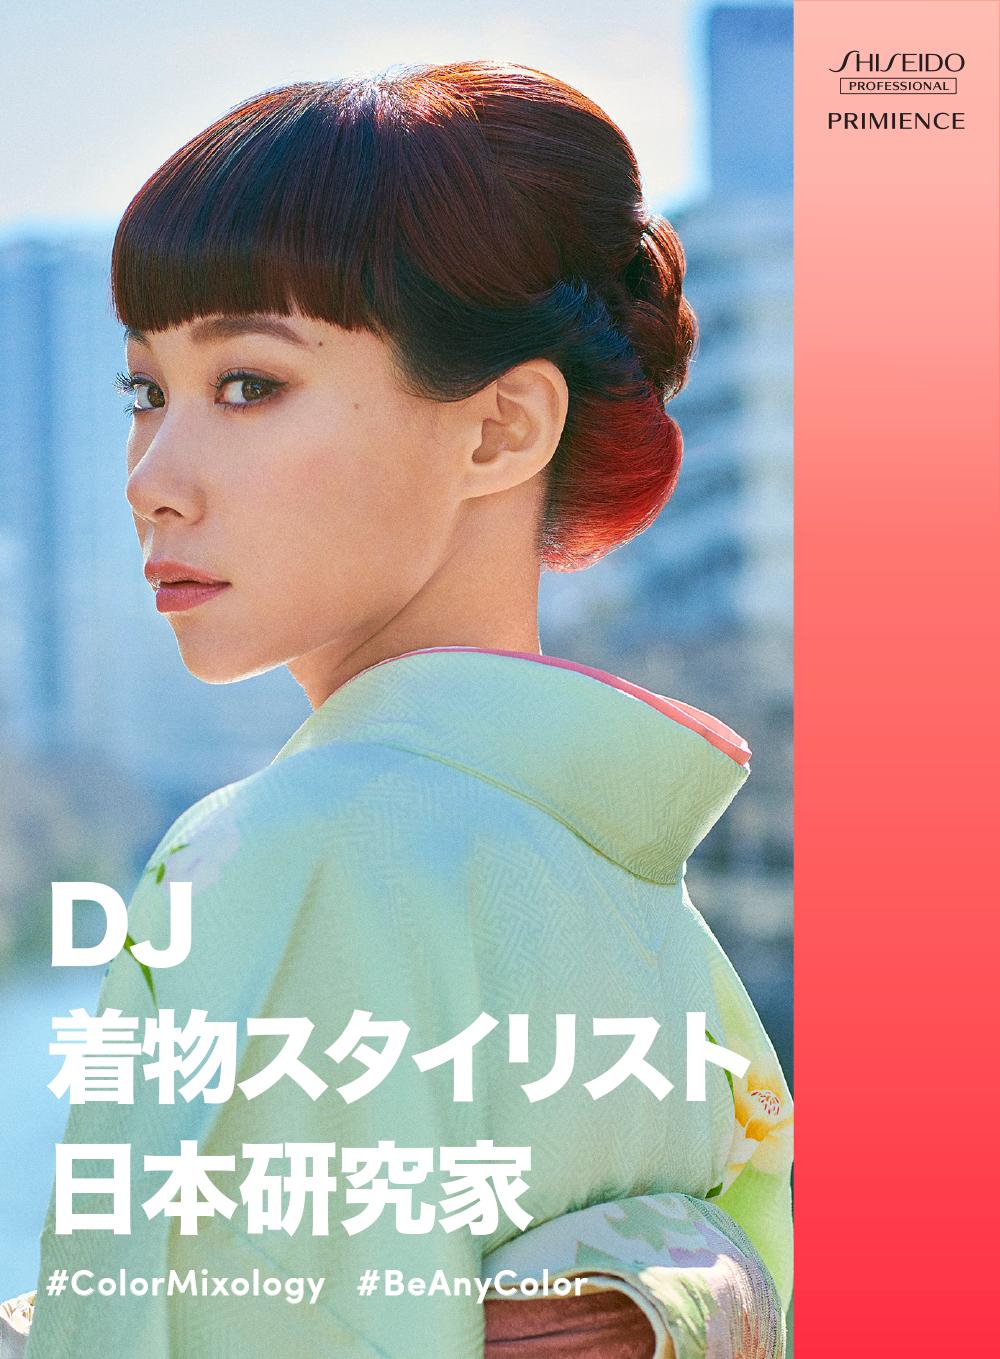 Shiseido - Film and Photo Art Direction + Design